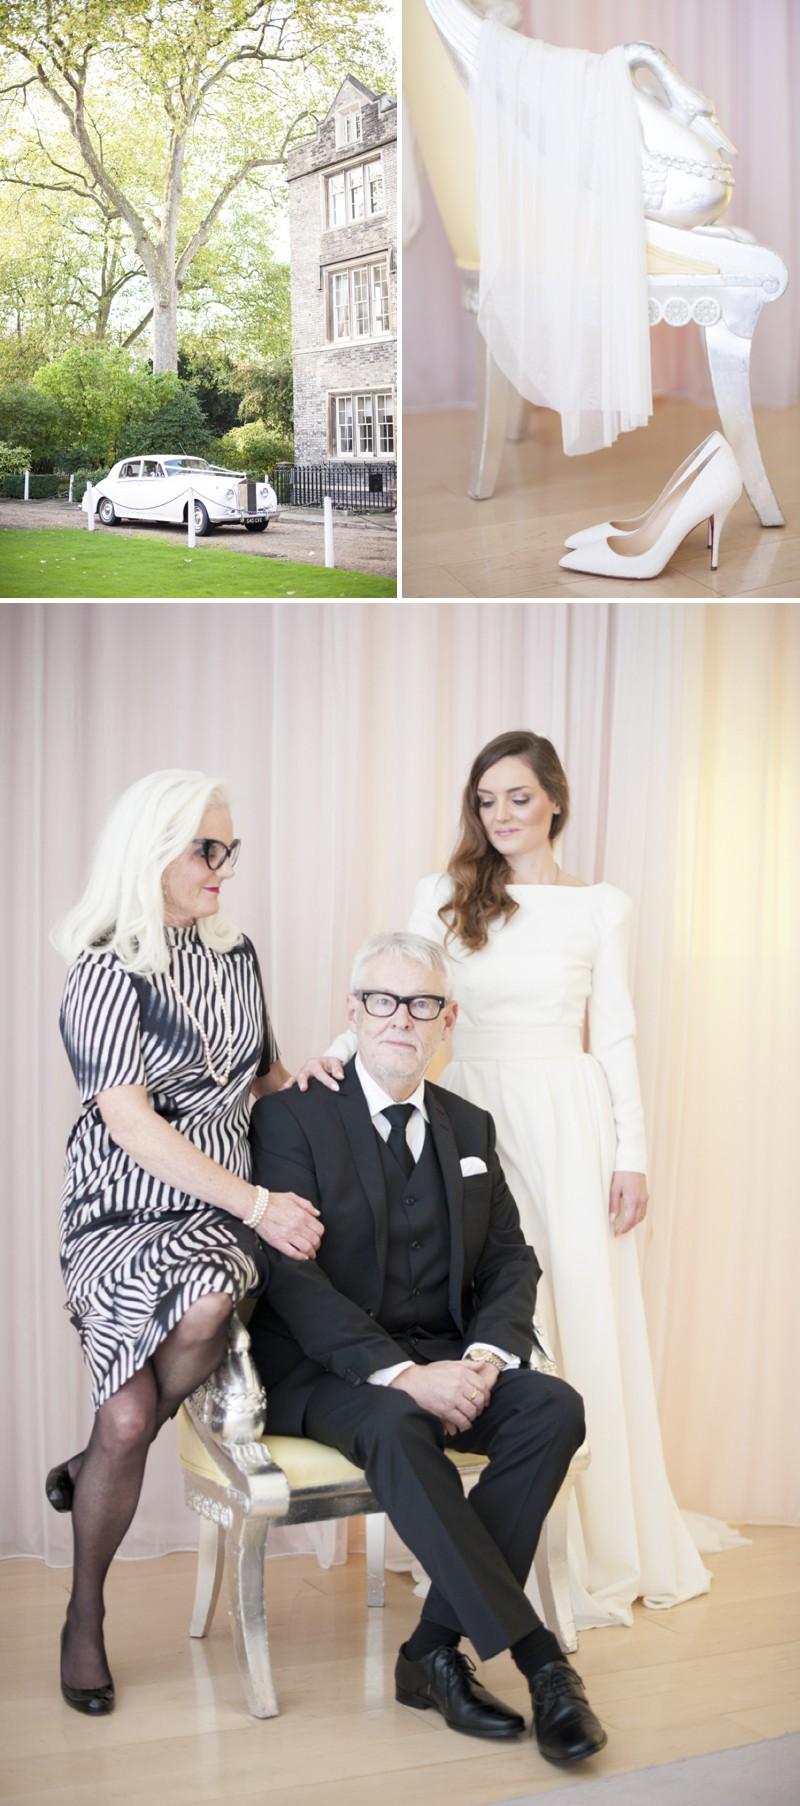 An Edgy And Urban London Wedding Full Of Danish Wedding Traditions ...